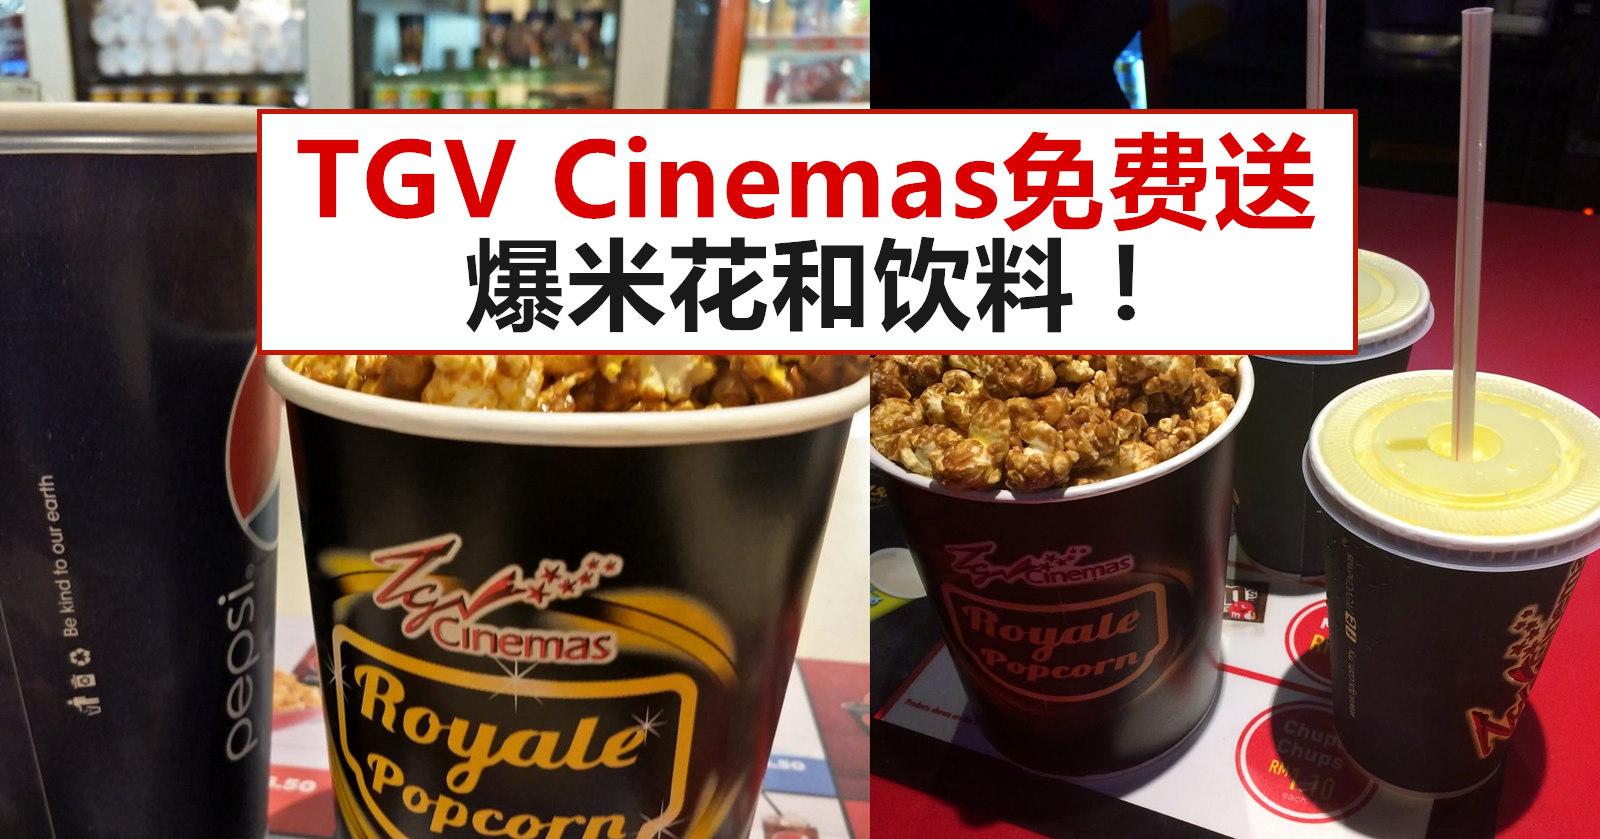 TGV Cinemas免费送爆米花和饮料!